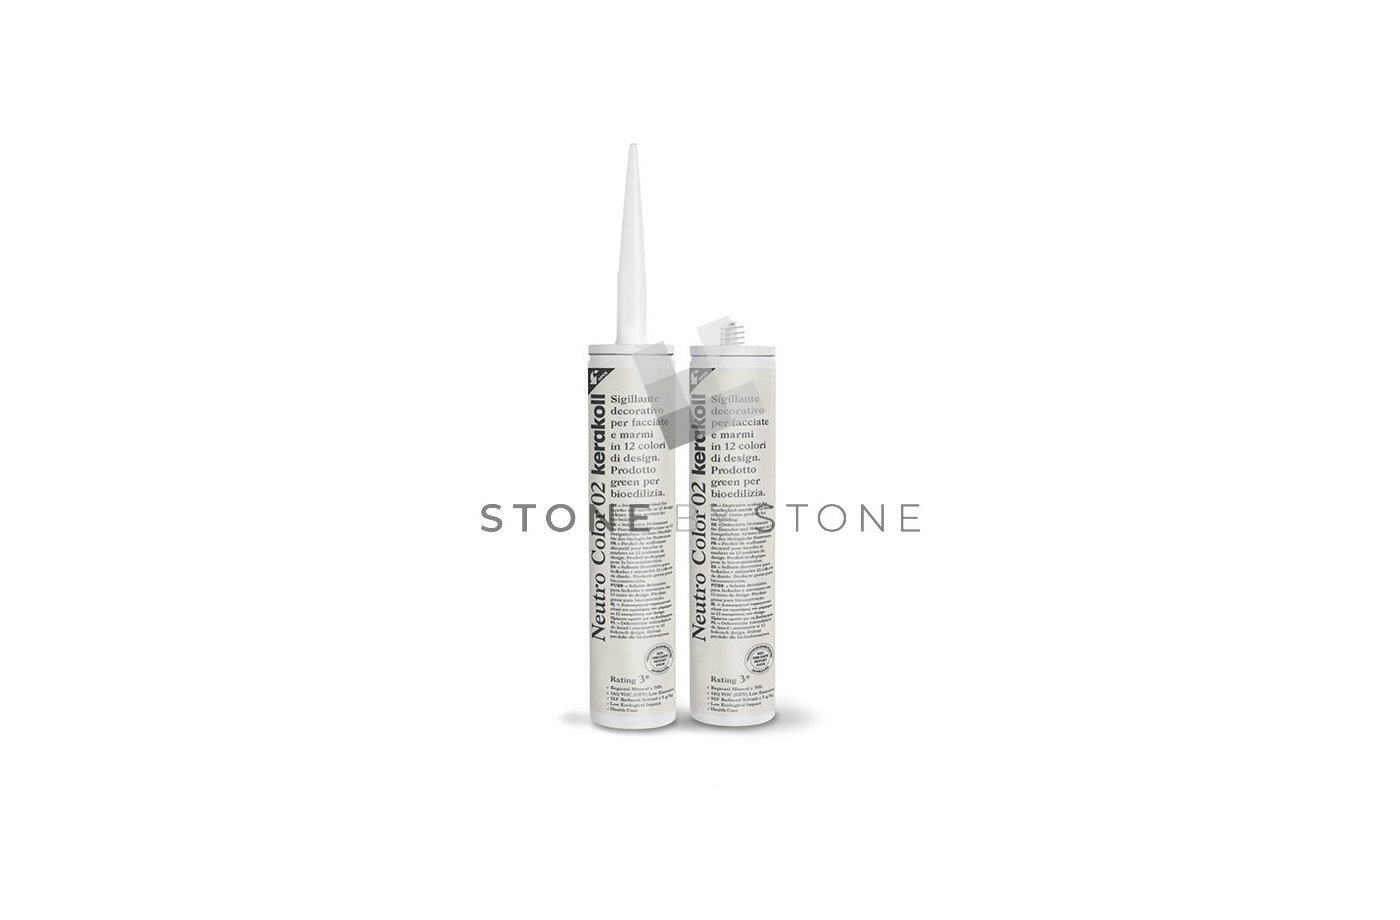 Silicone spécial pierre - KERAKOLL - Neutro Color Beige (25) - 310 ml